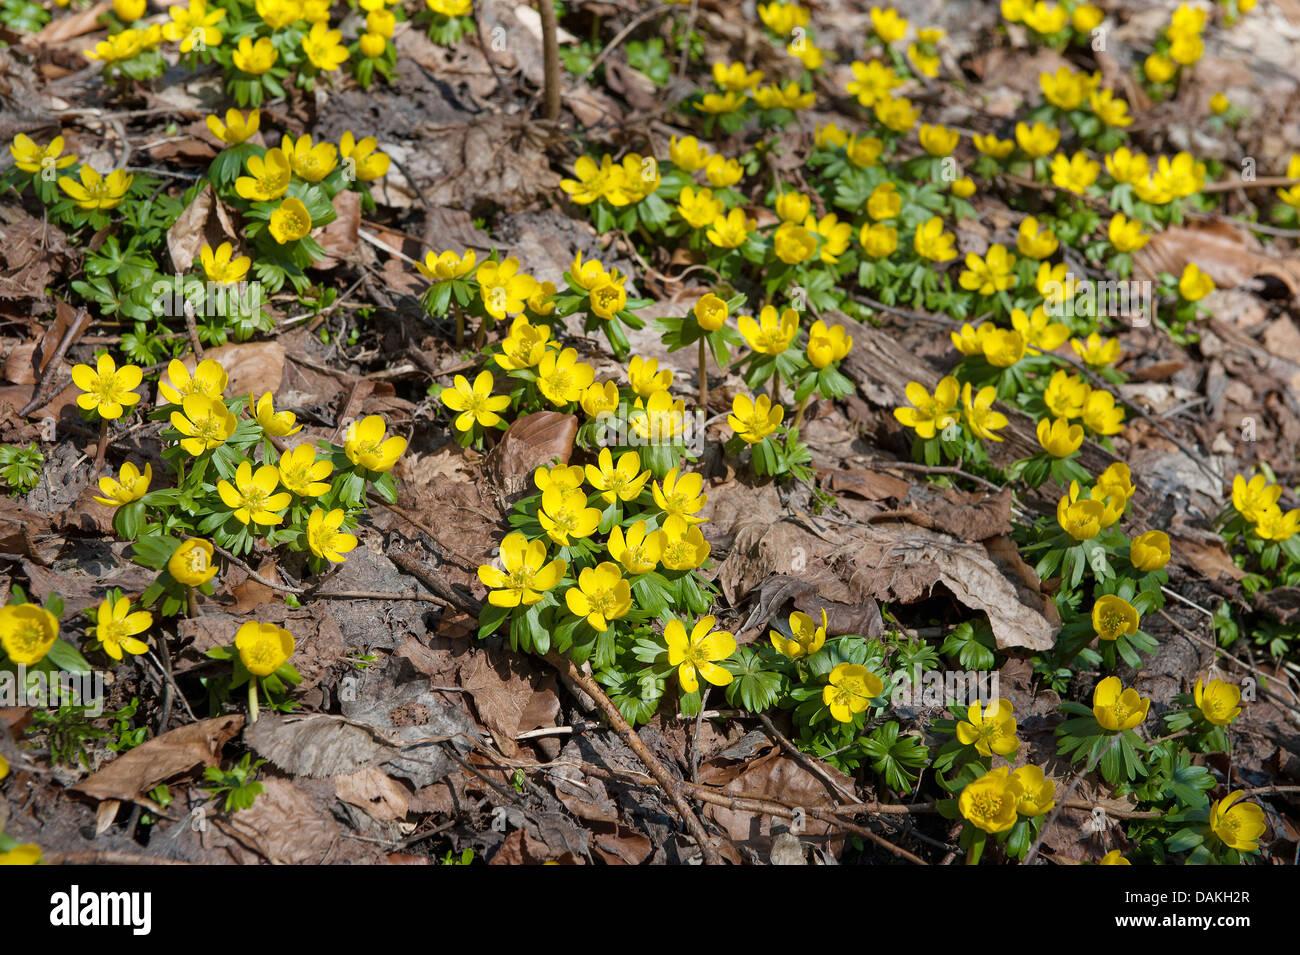 winter aconite (Eranthis hyemalis), blooming, Germany - Stock Image